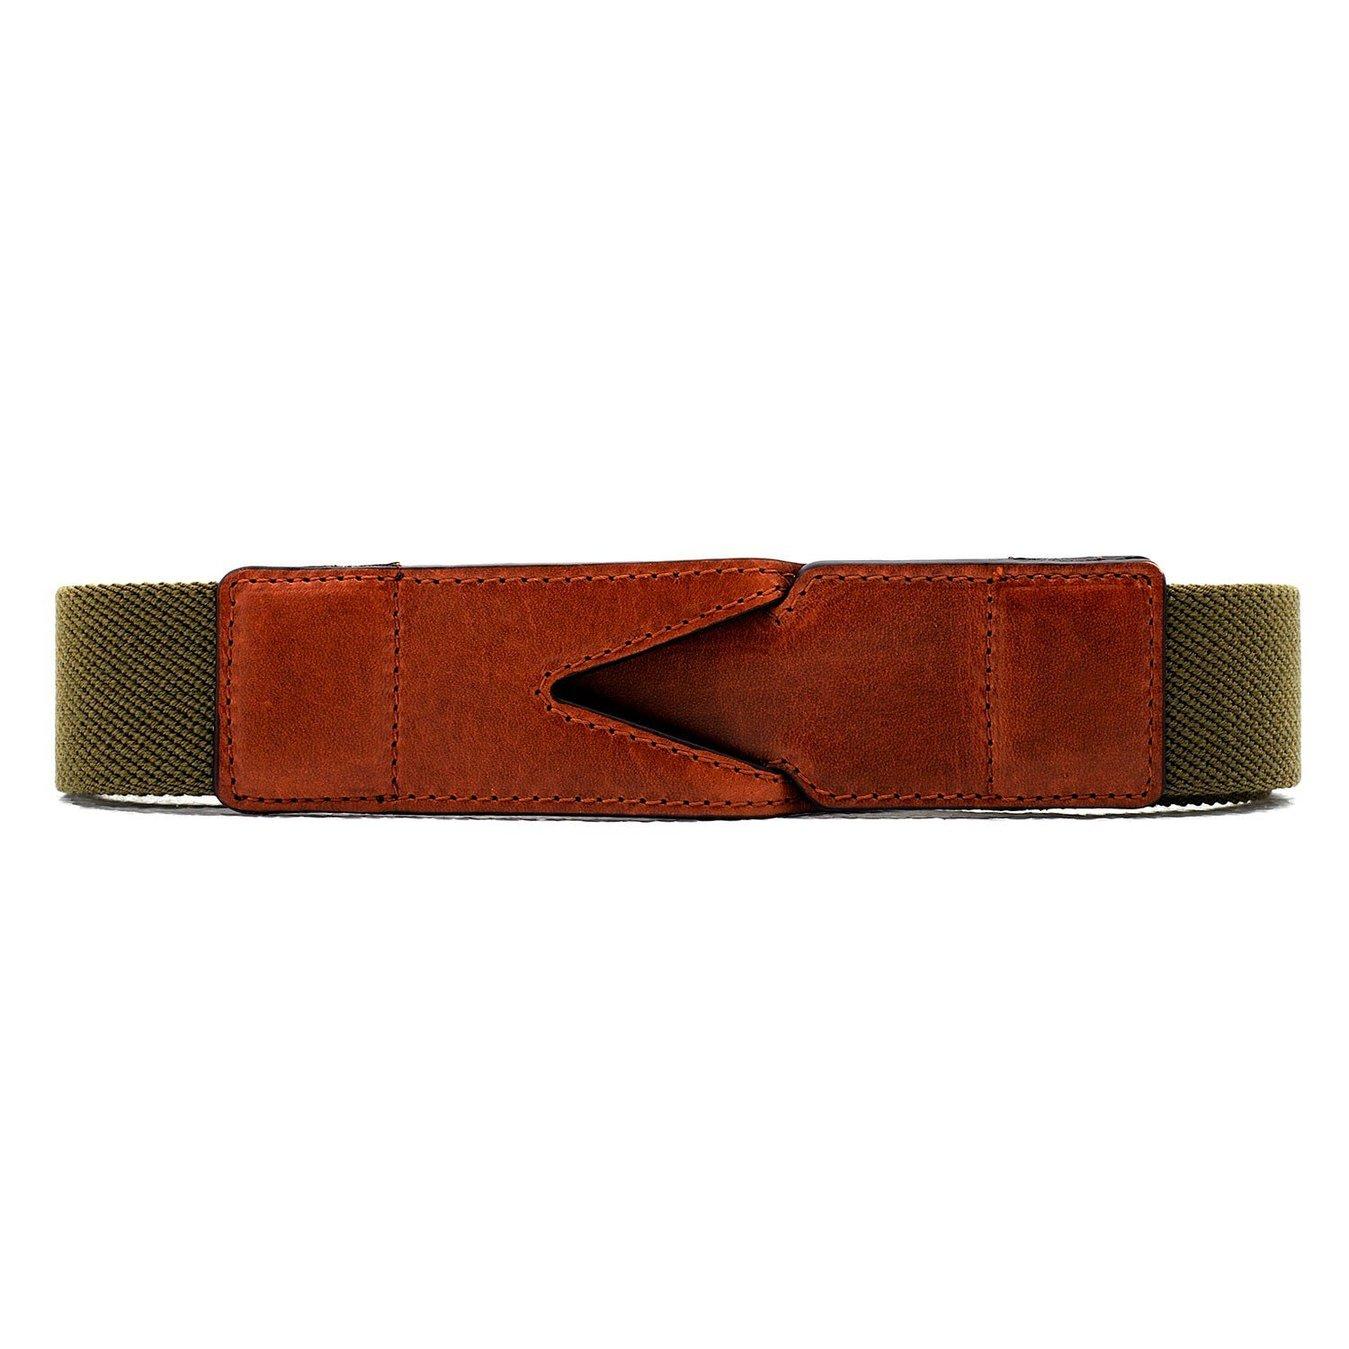 La Portegna - La Portegna Cotton Leather Hand made Green Travel Belt